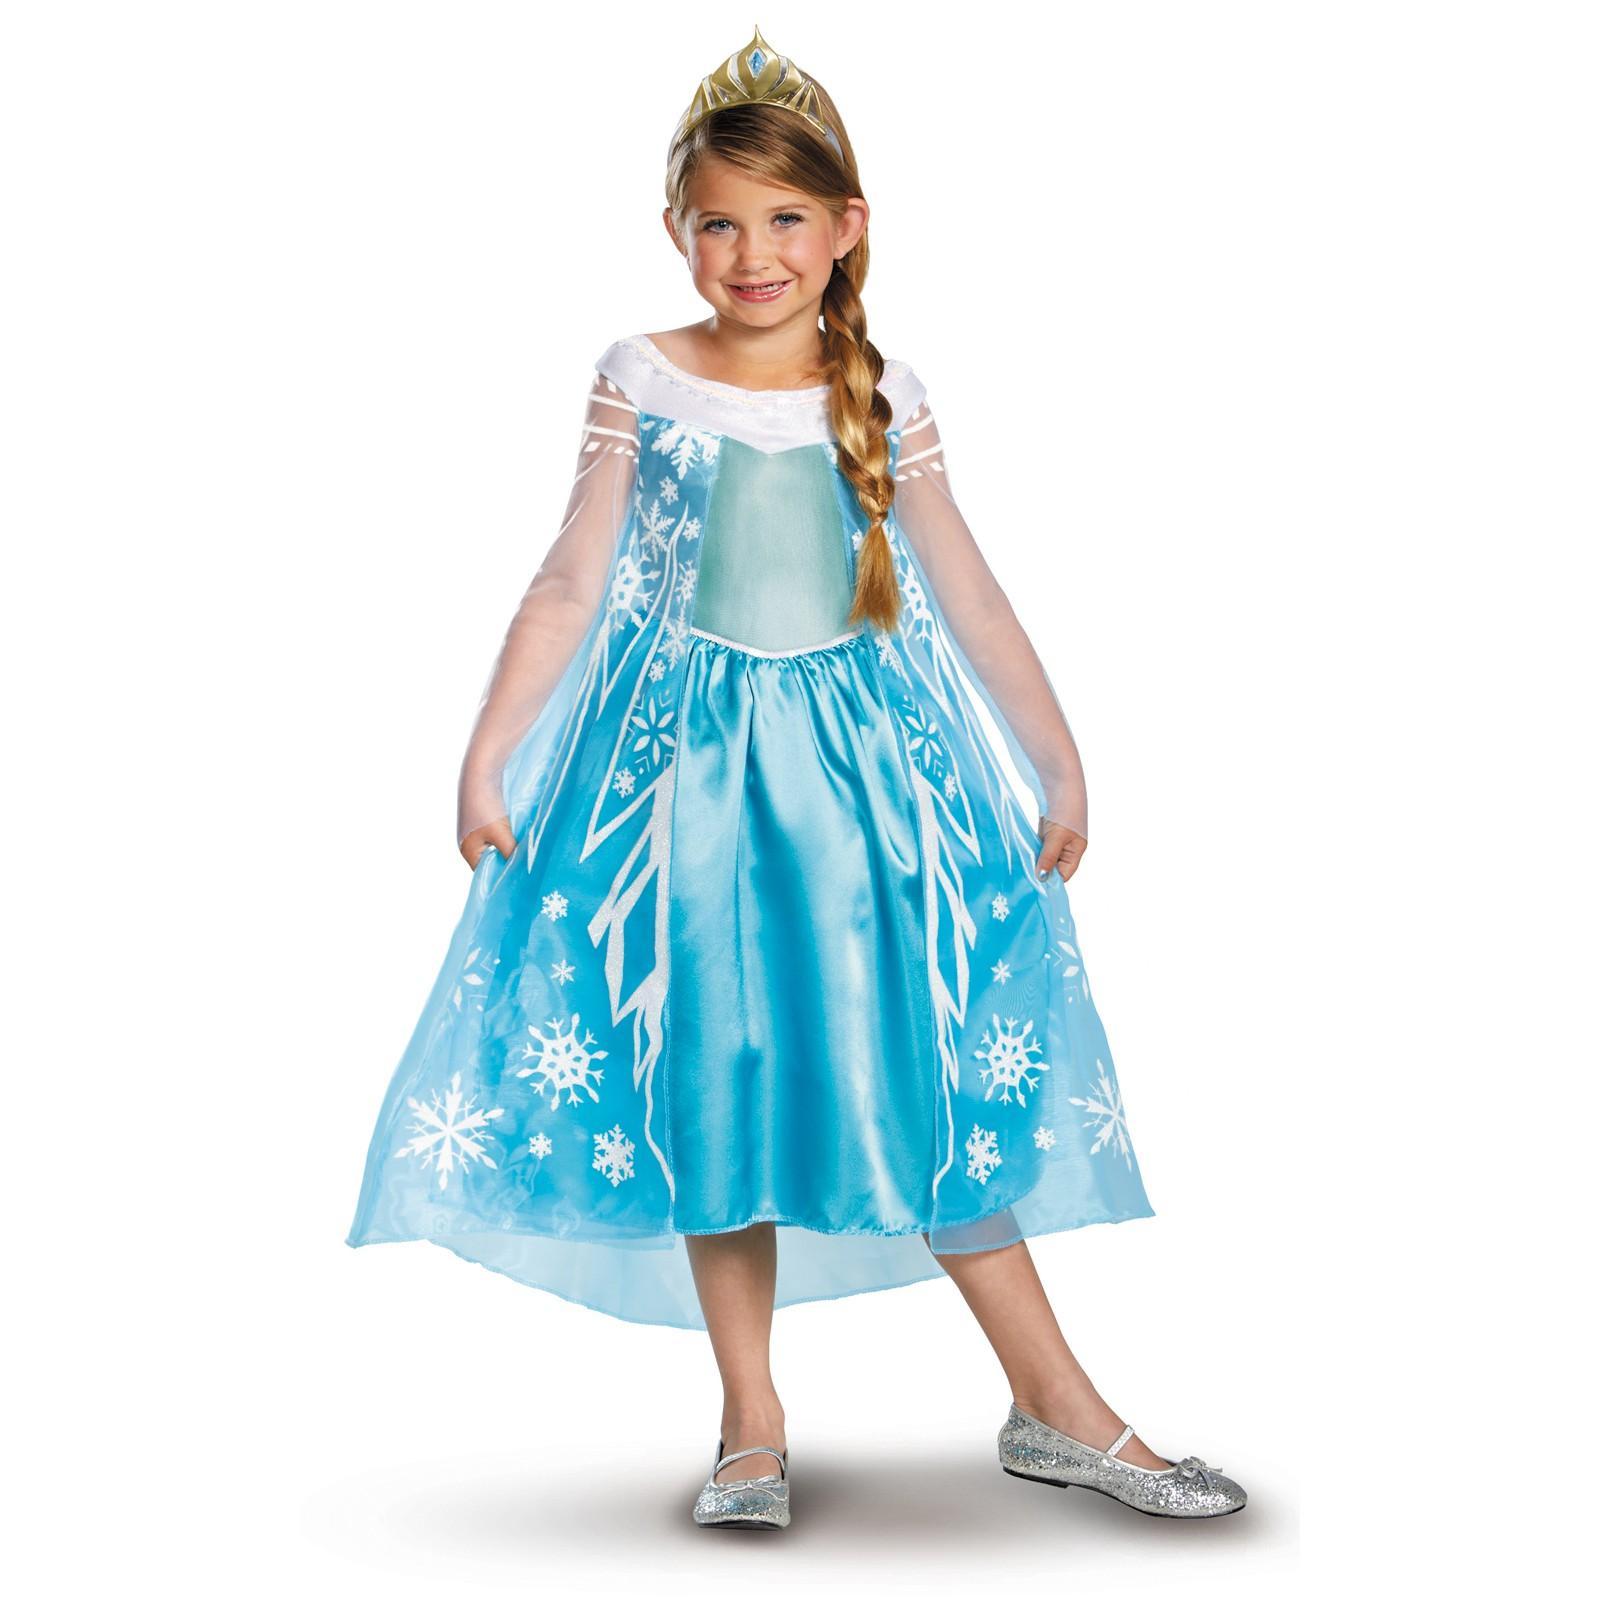 Frozen Costume Sale, Elsa Costume